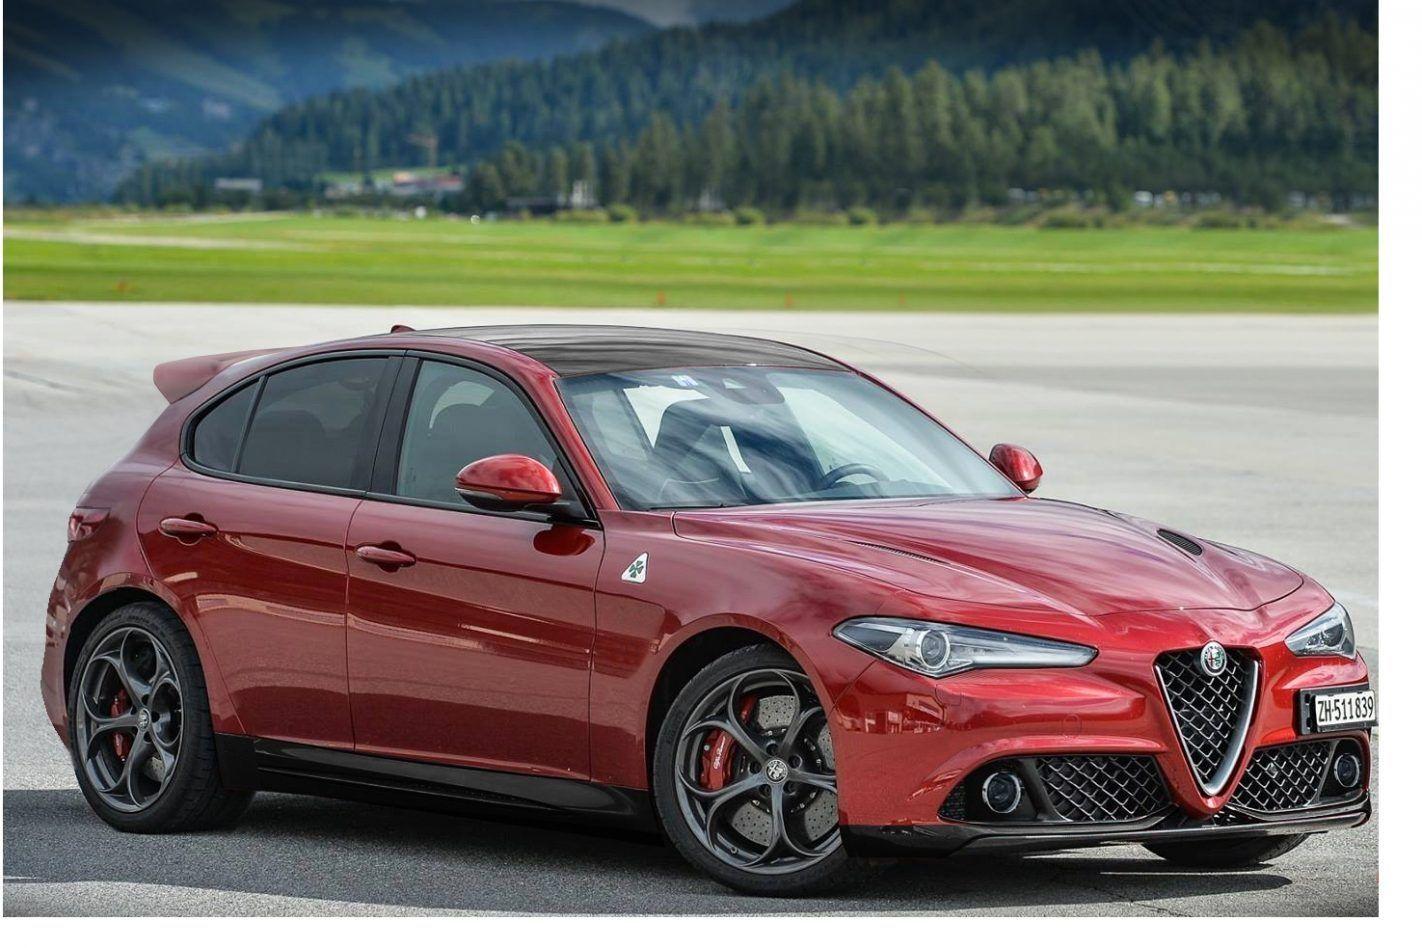 New Alfa Romeo Giulietta 2019 Price Cars Review 2019 Alfa Romeo Giulietta Alfa Romeo Alfa Romeo Giulia